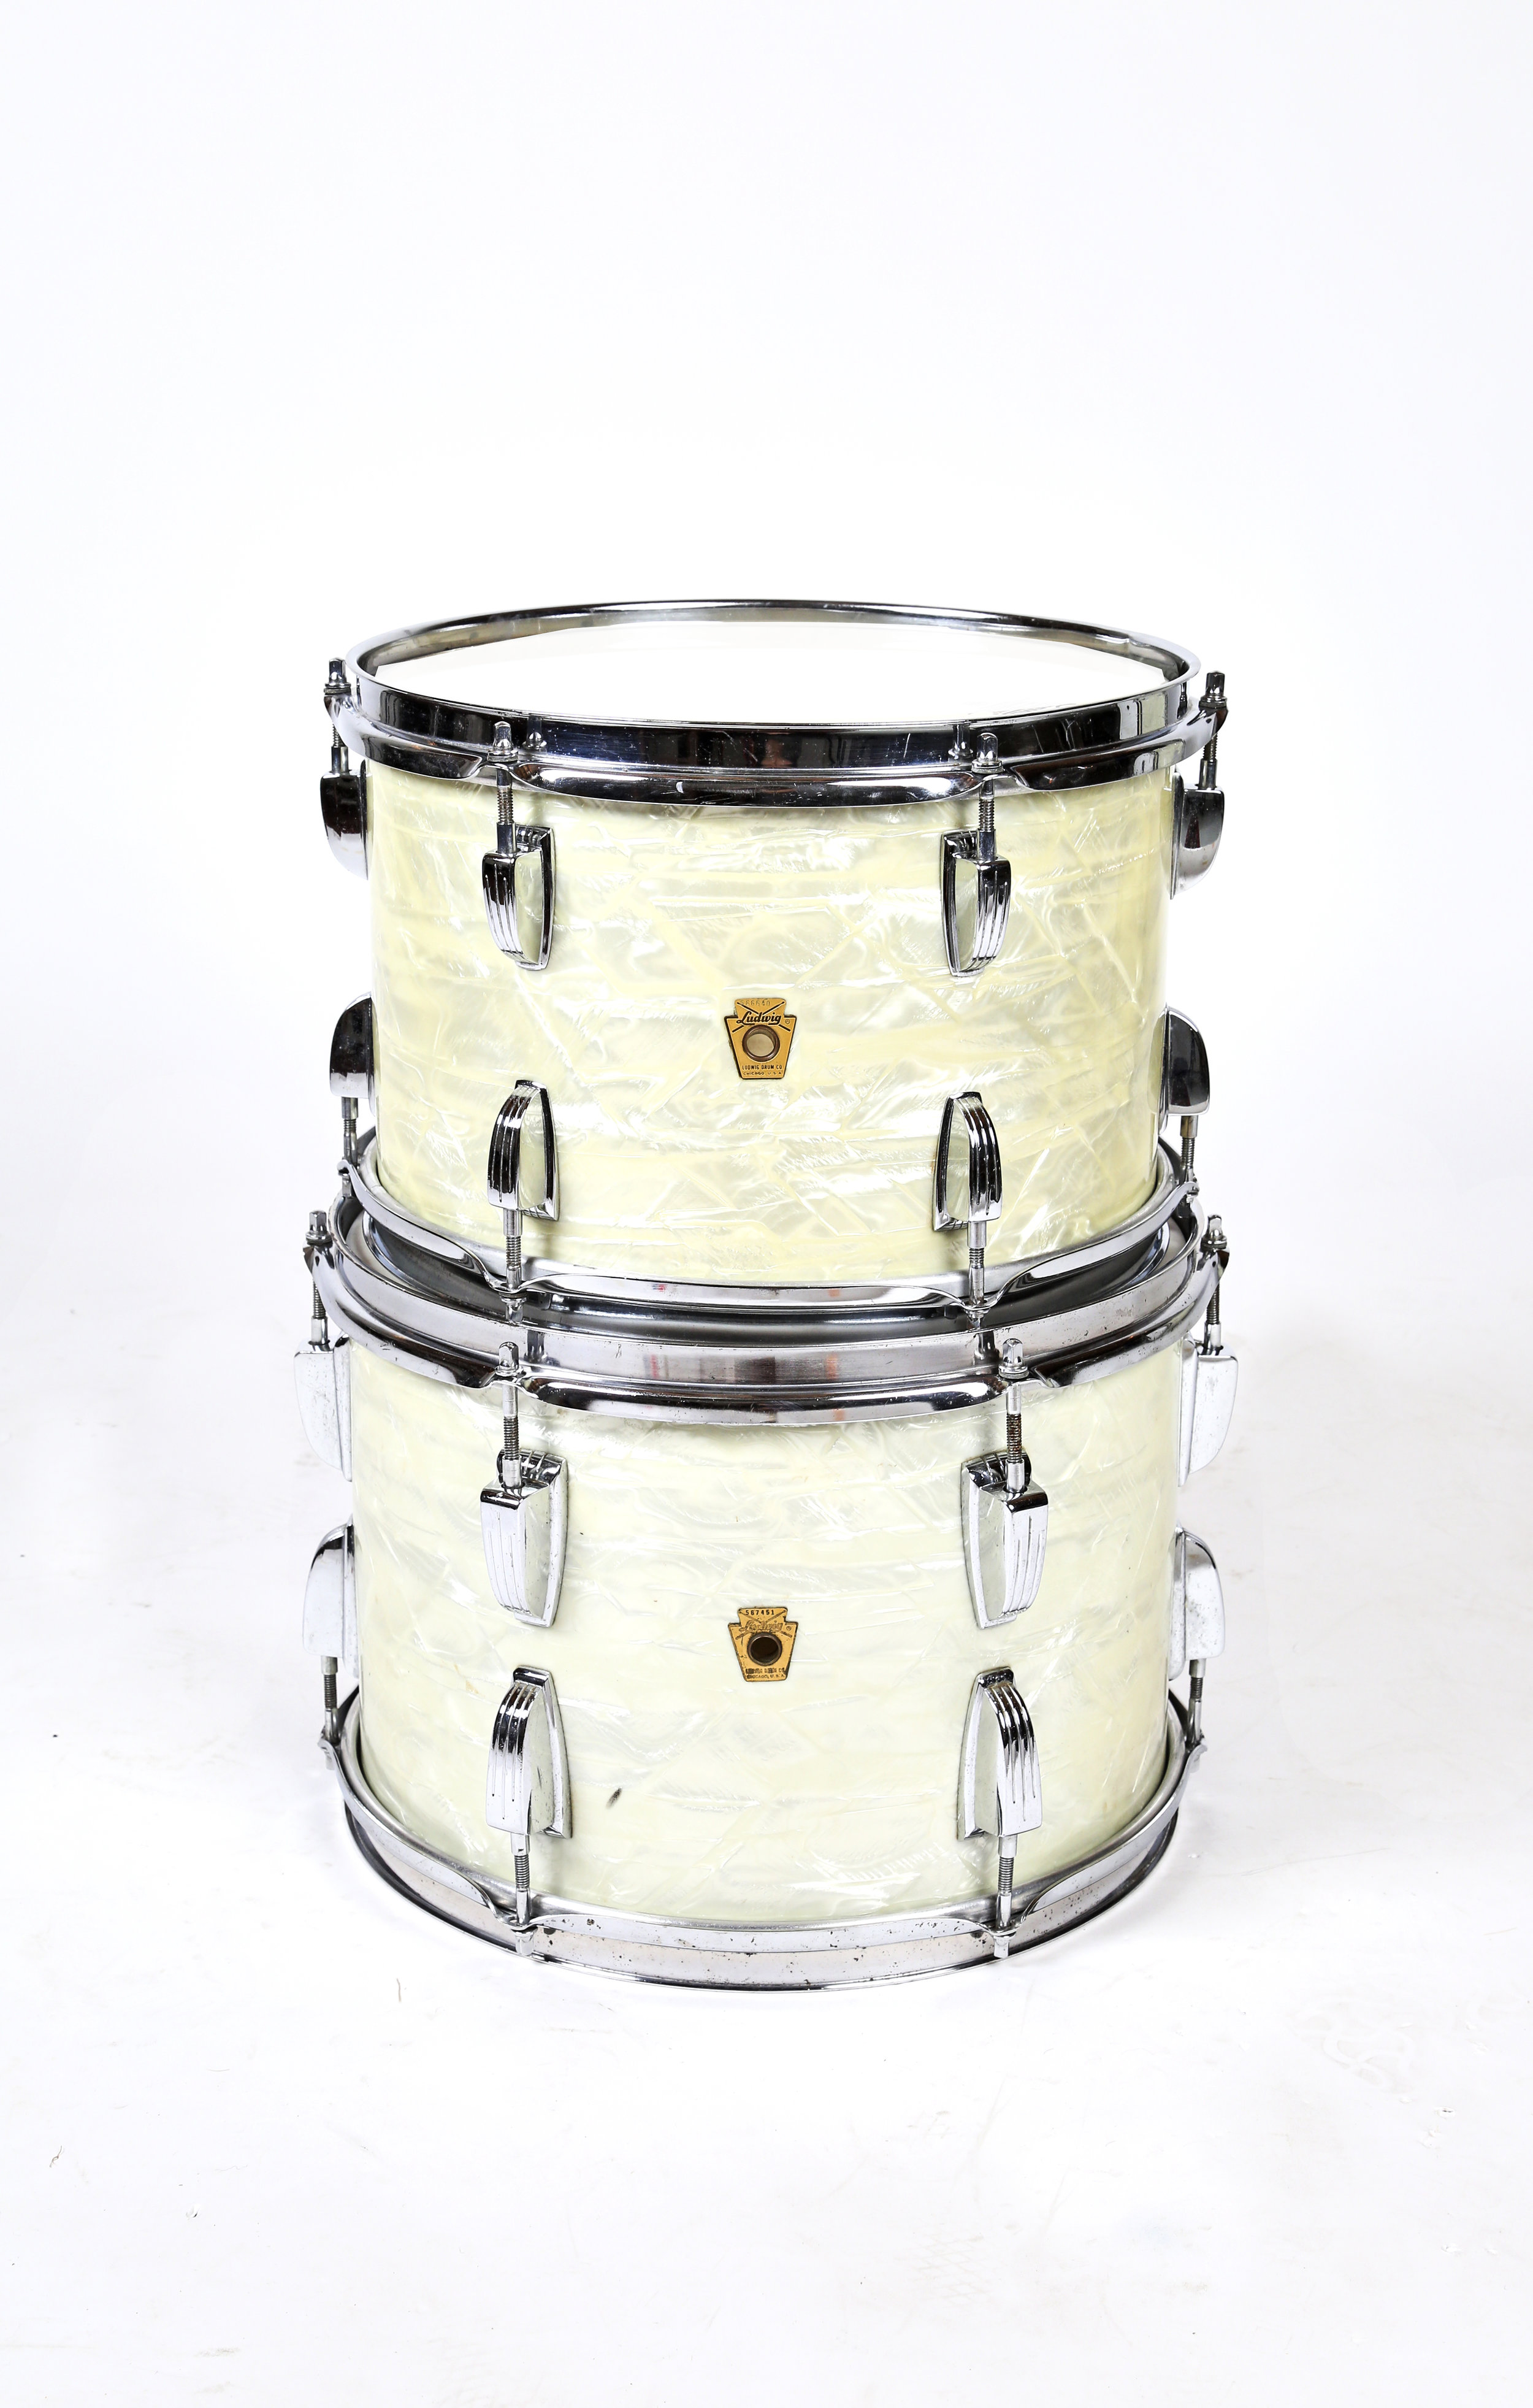 Dorio Vintage Drum_C&C Big Red_1946.jpg